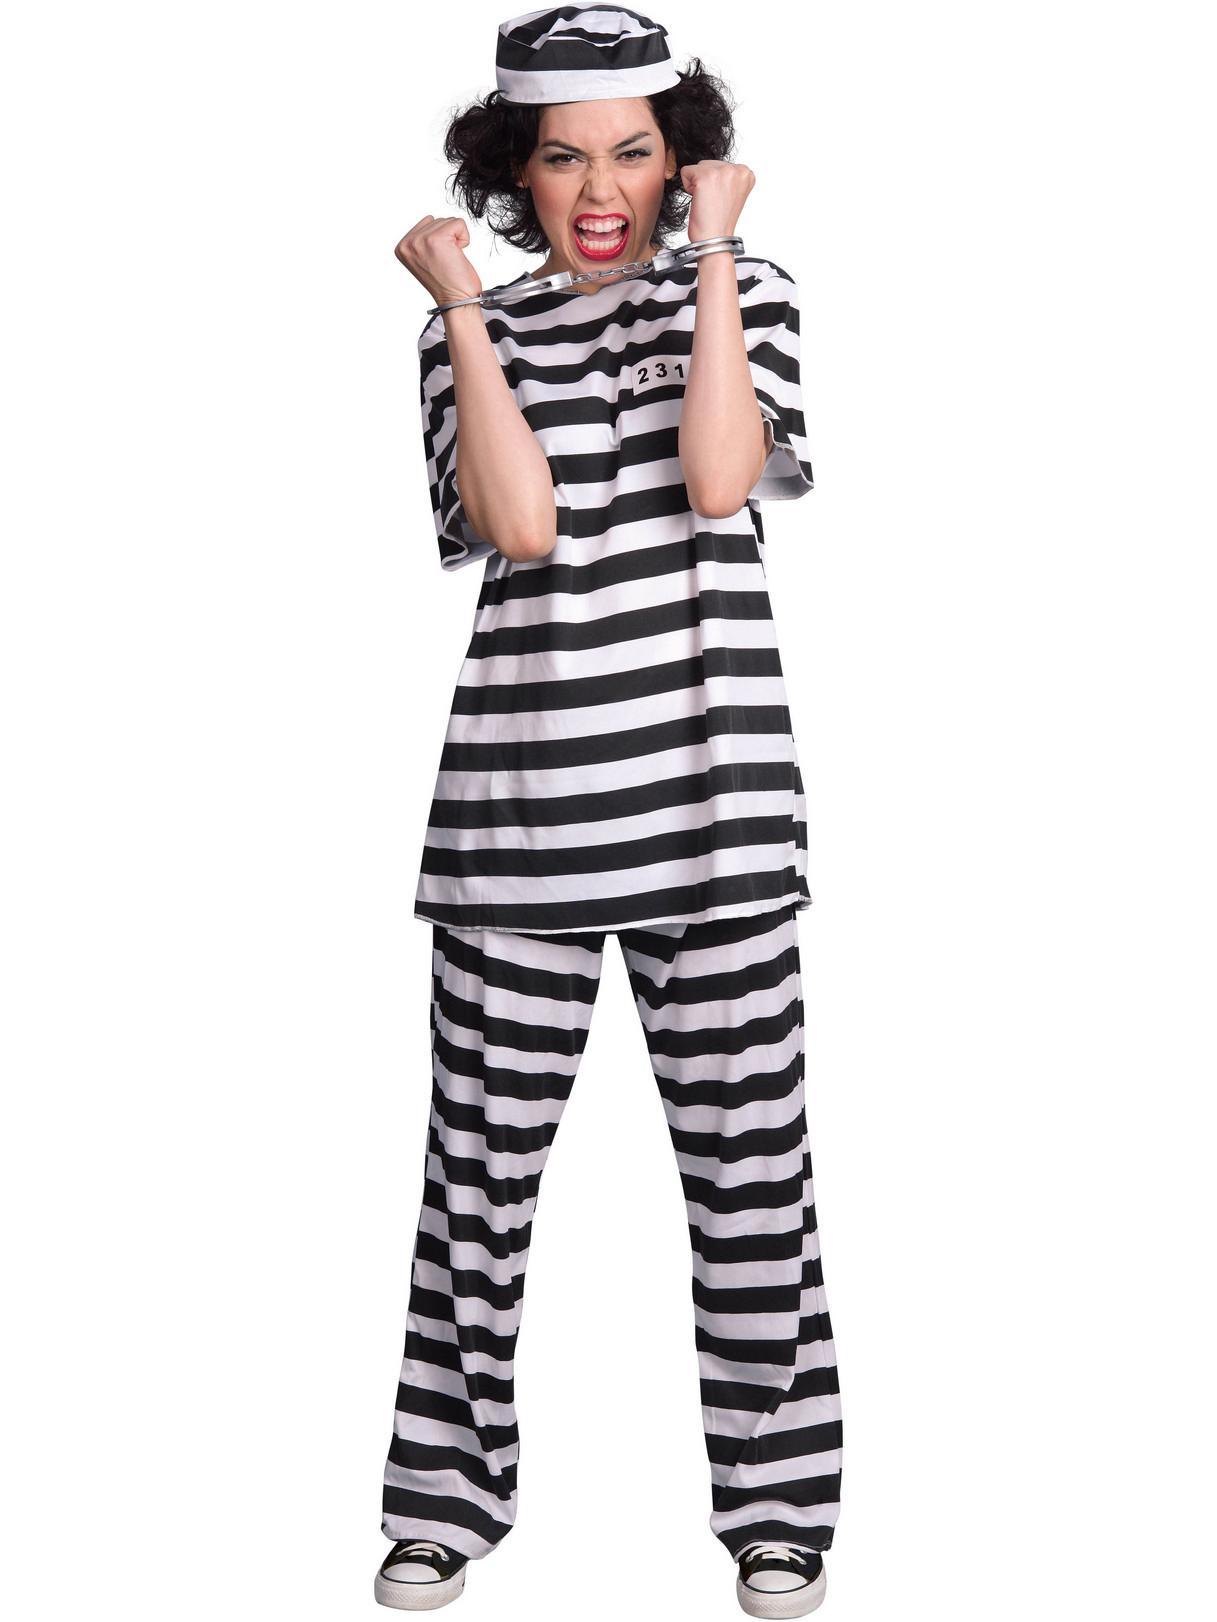 Female Prisoner Adult Costume Buycostumescom  sc 1 st  Meningrey & Prisoners Costumes - Meningrey